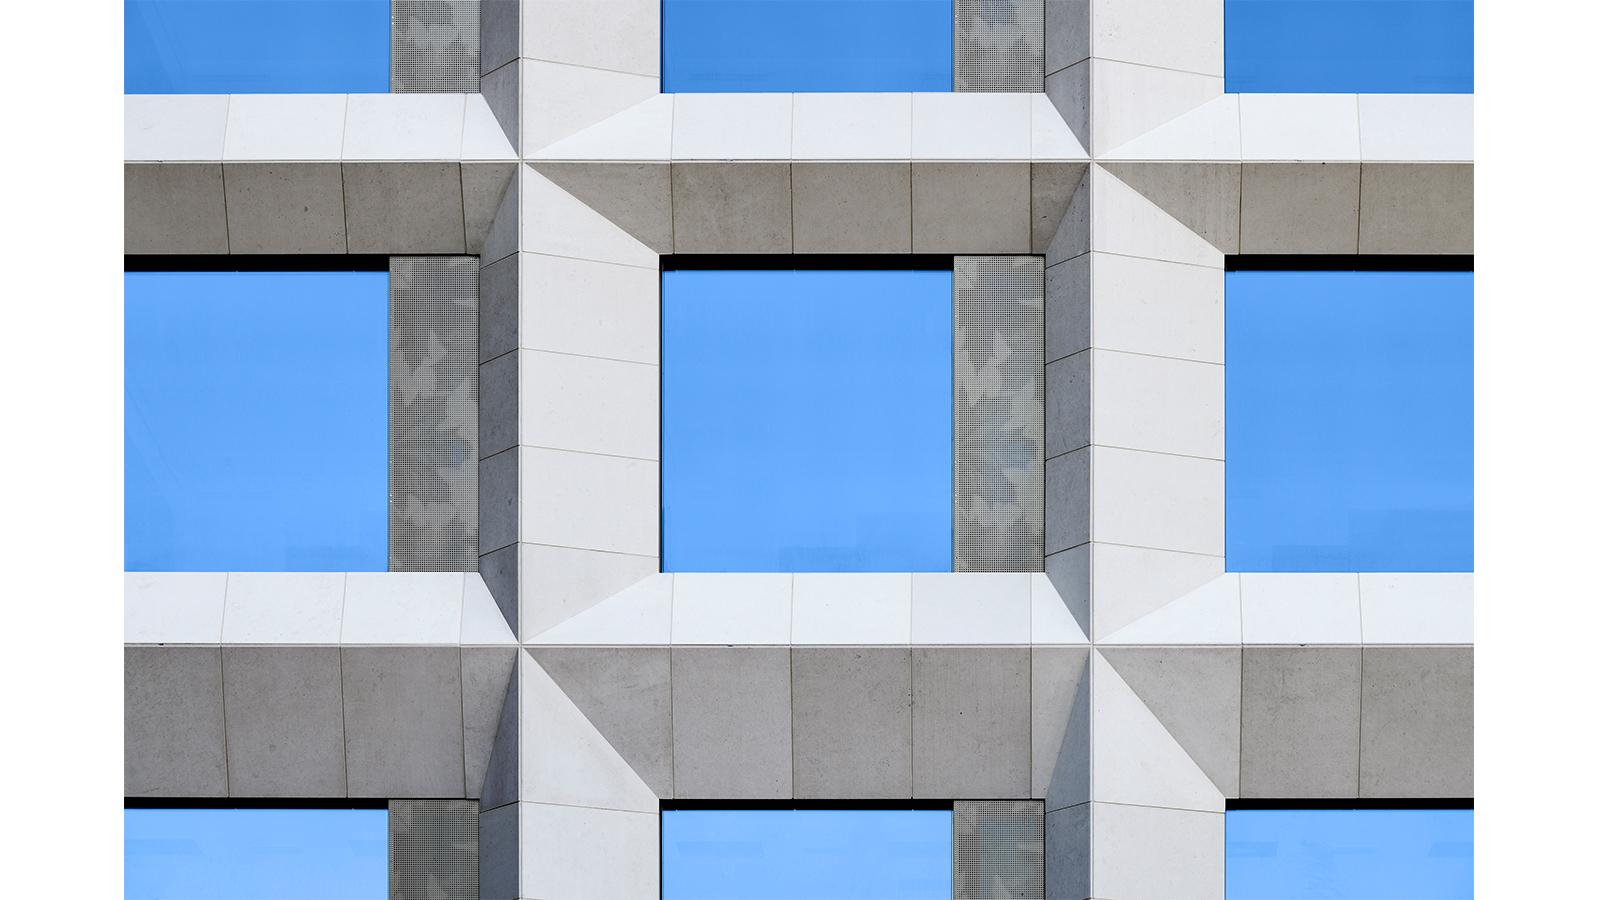 h2m-architekten-fassade-klinikum-kulmbach-fertiggestellt-frontal-detail